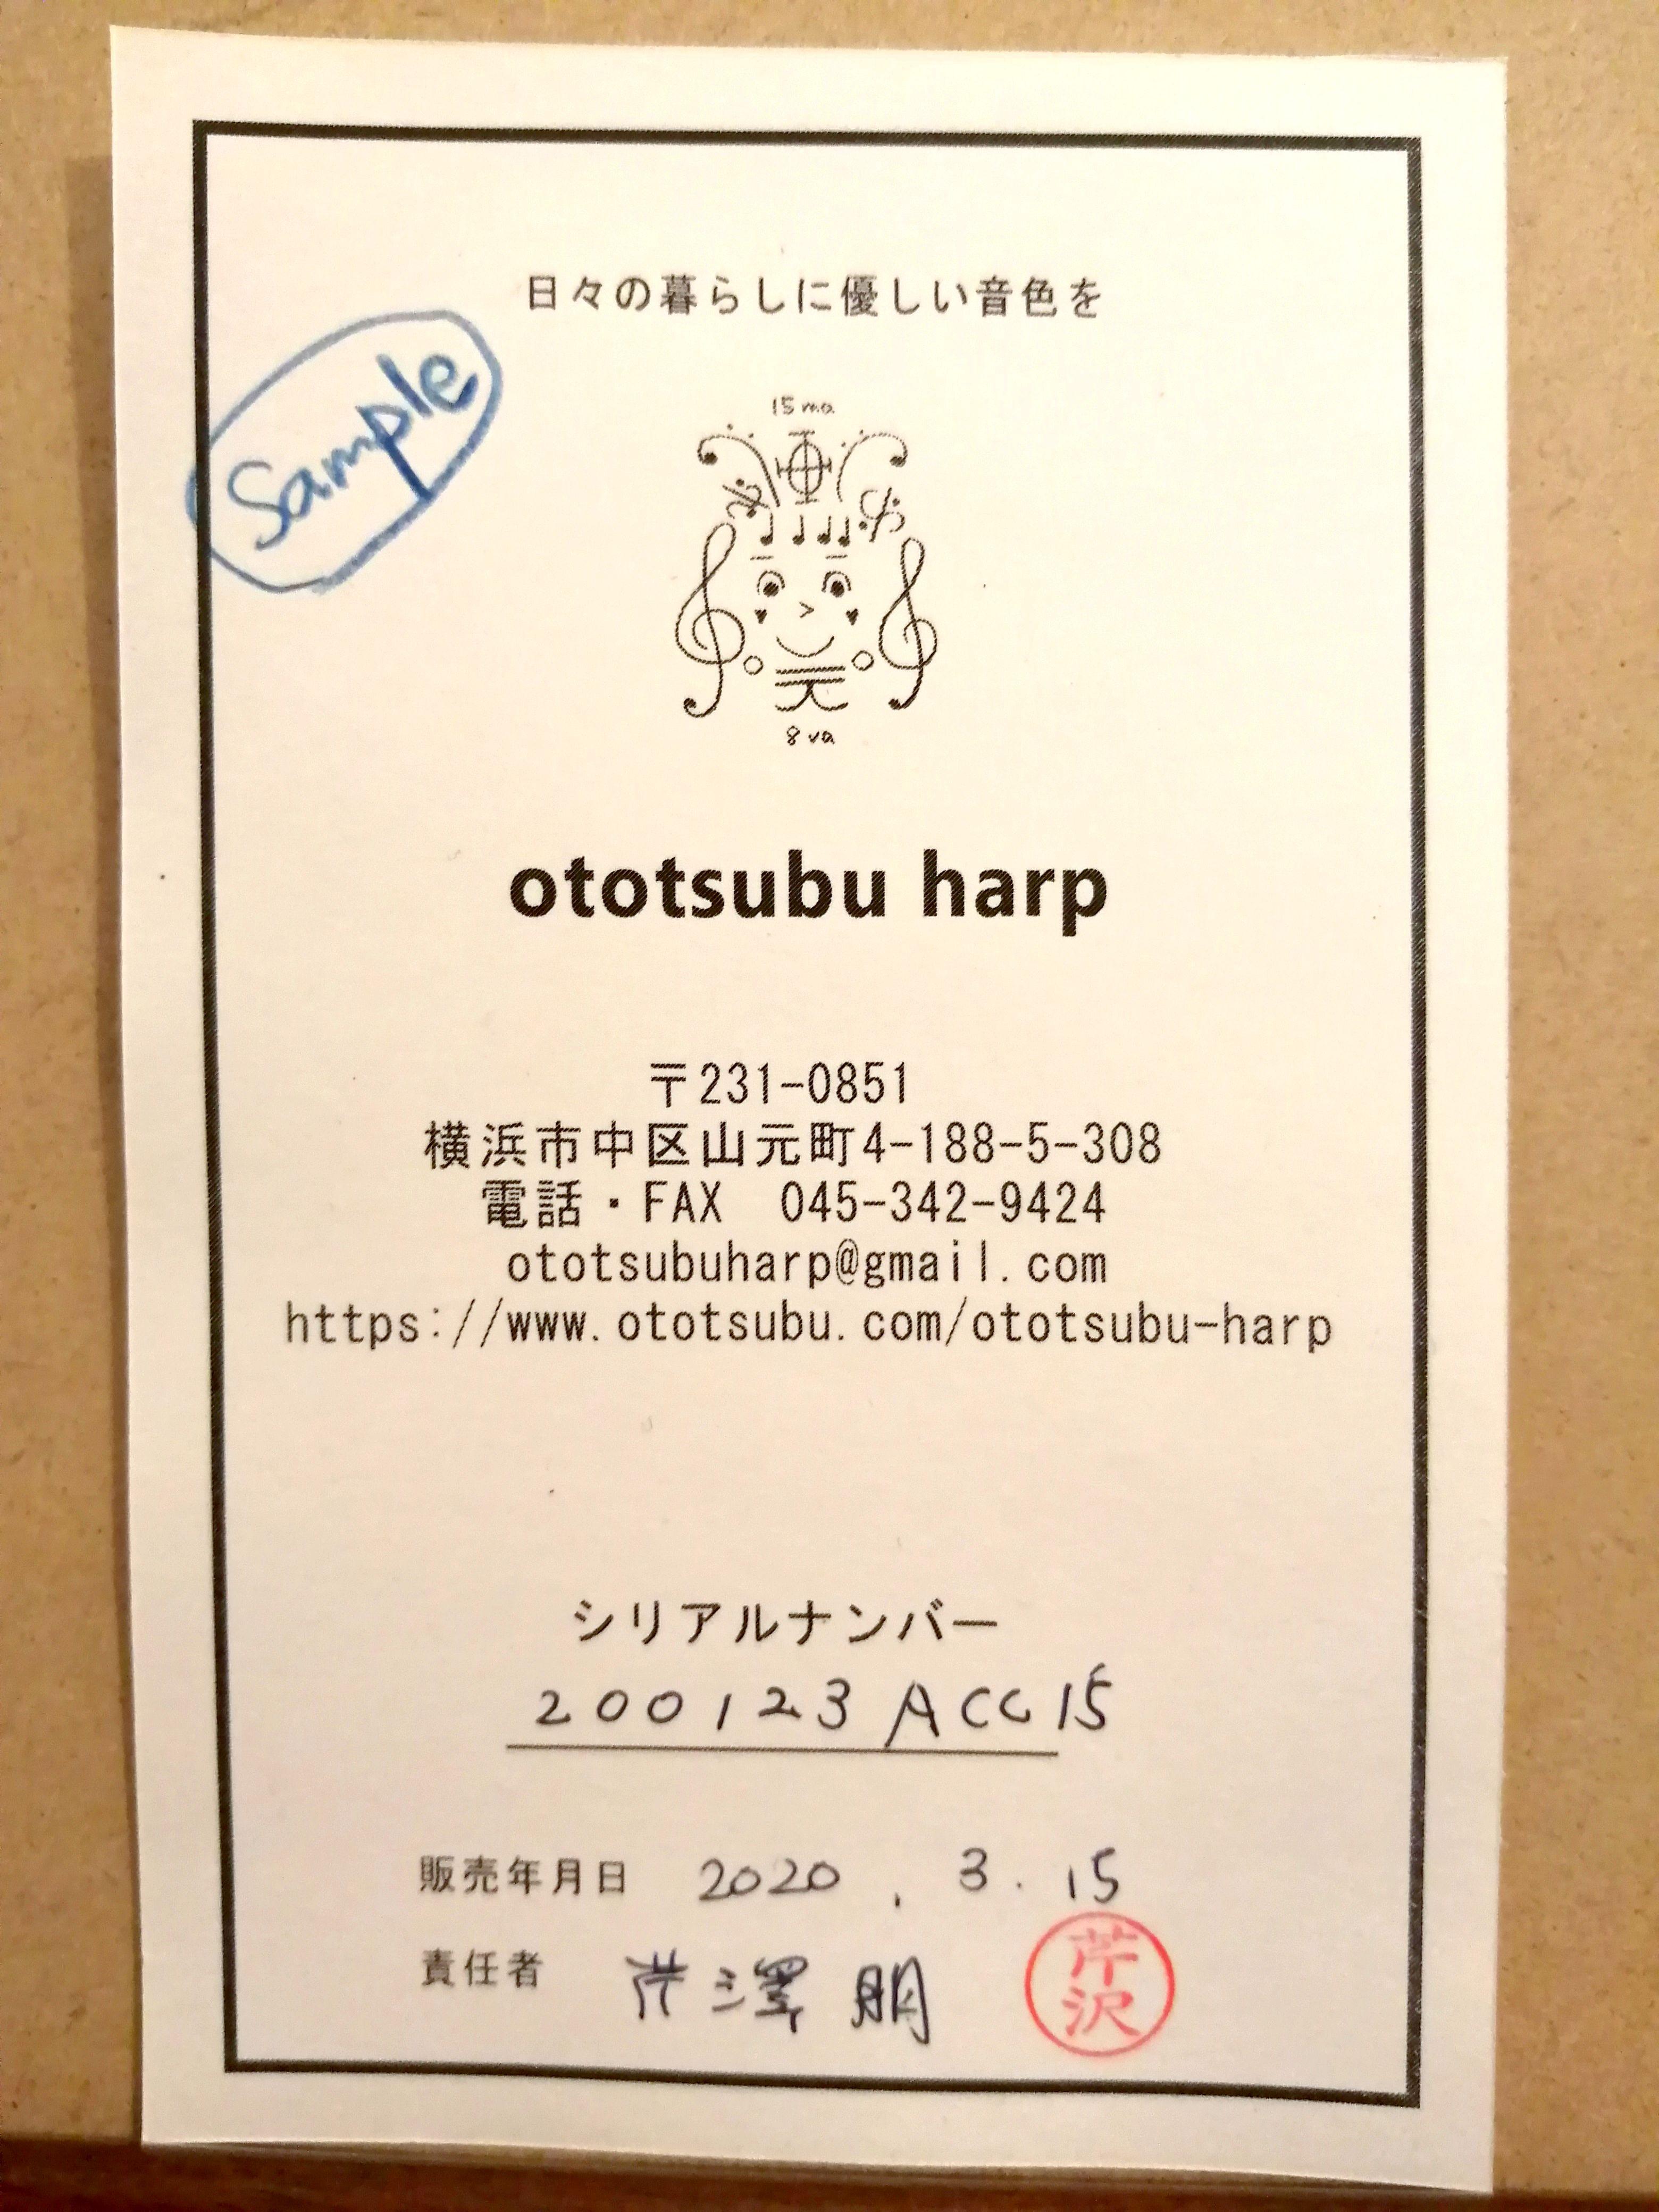 ototsubu harp シリアルナンバー